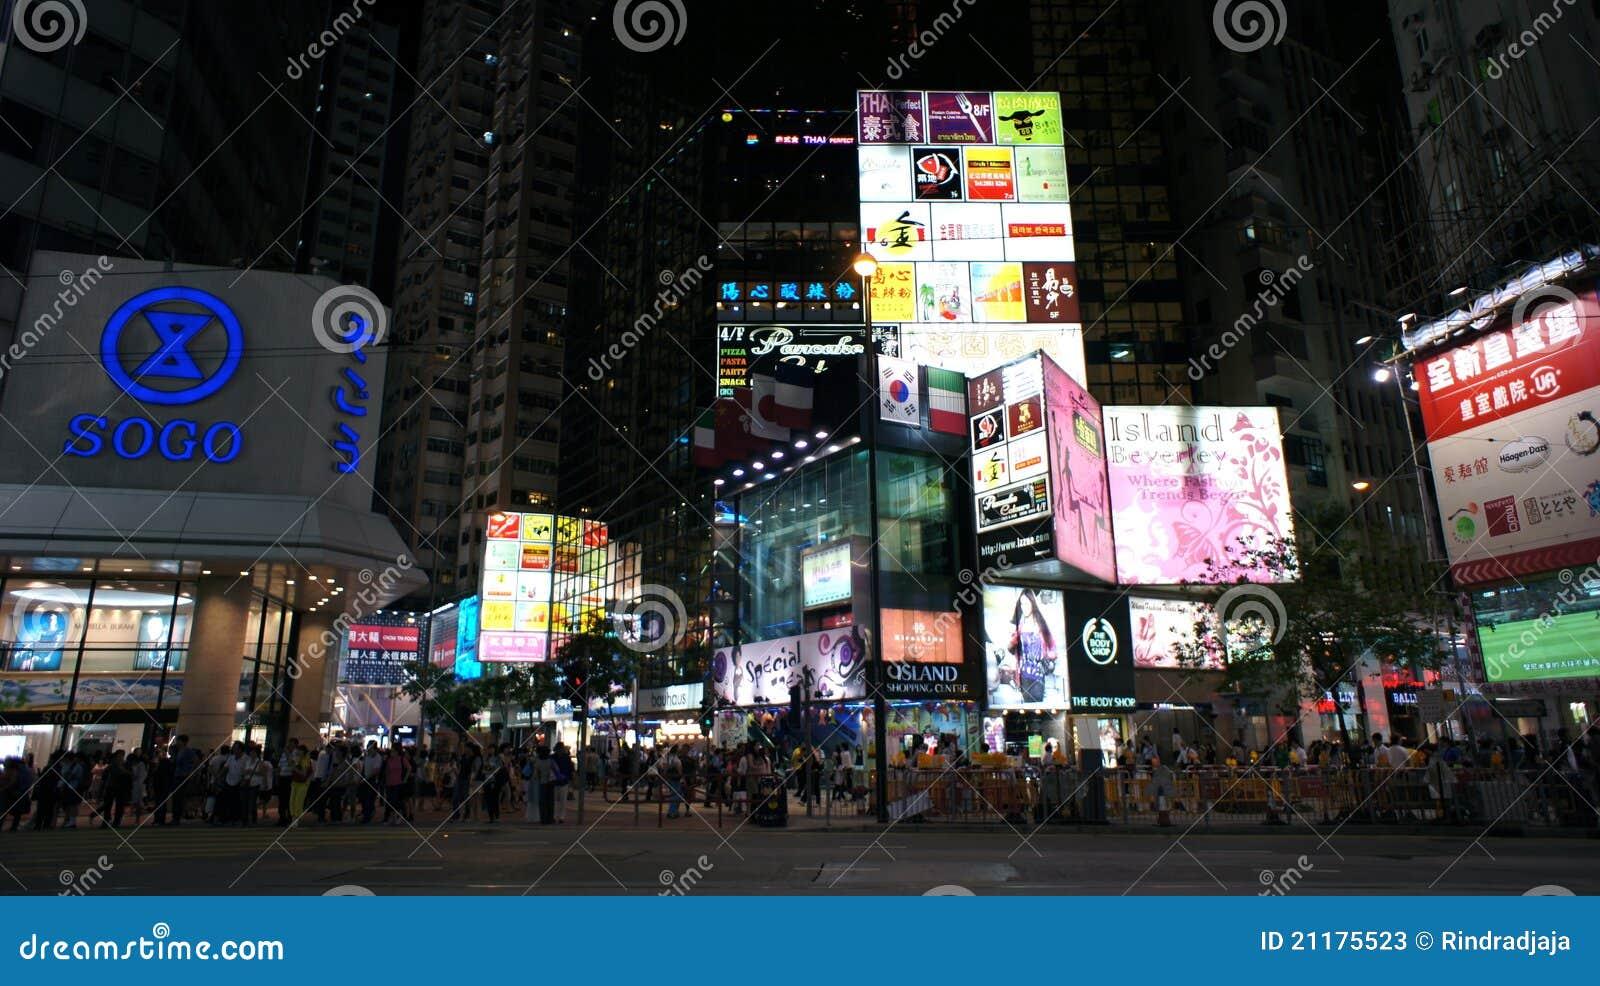 Nighttime at Causeway Bay, Hong Kong